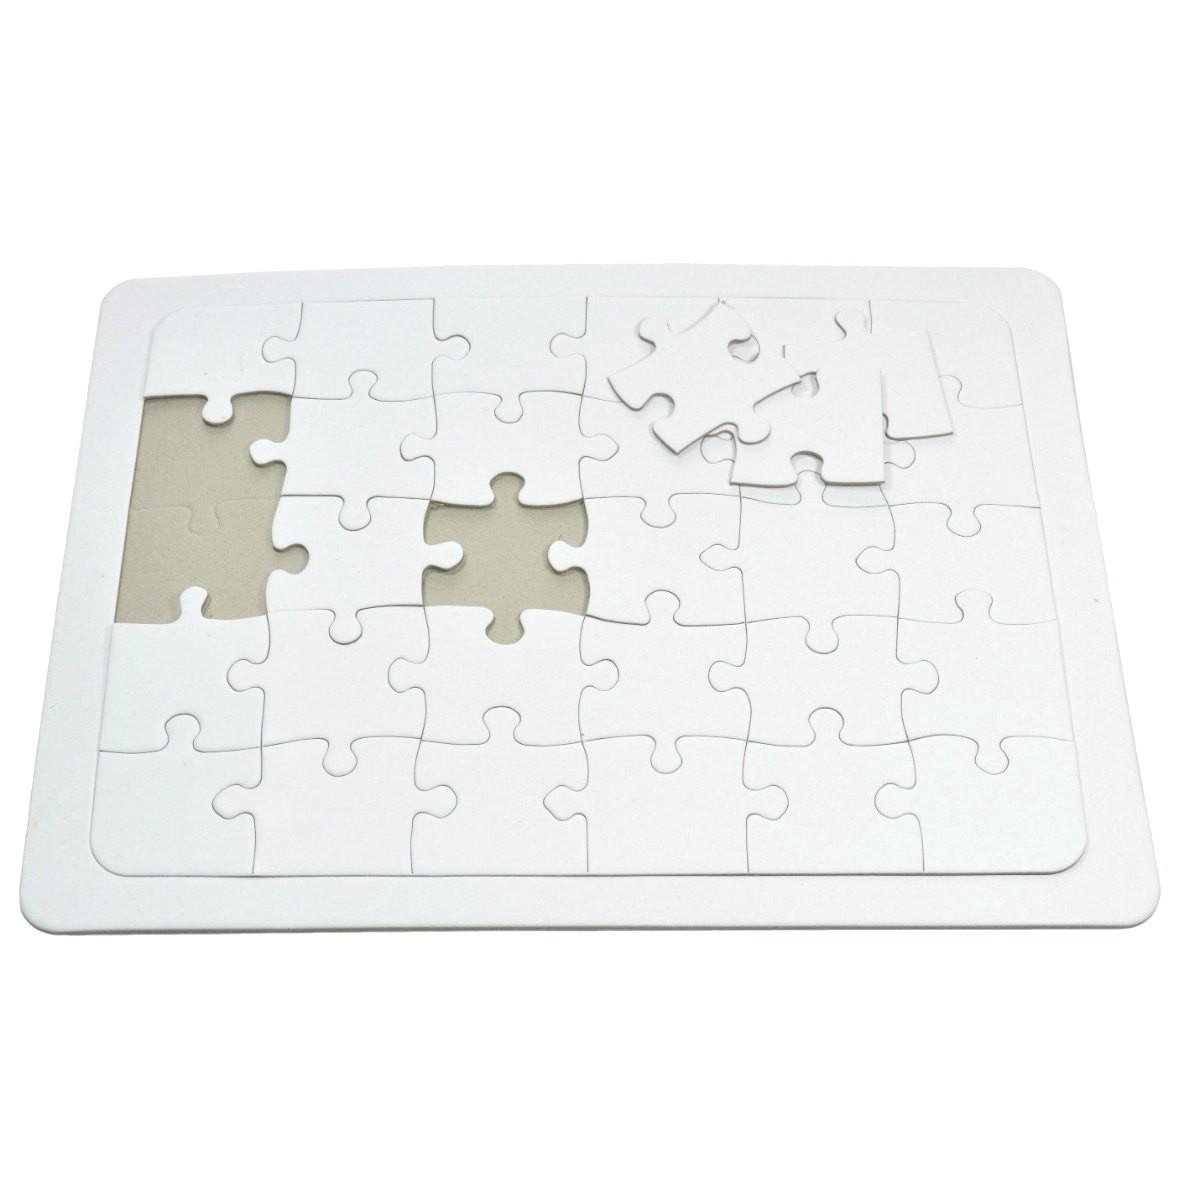 blanko puzzle a4 mit rahmen zum selber bemalen 30 gro e teile. Black Bedroom Furniture Sets. Home Design Ideas